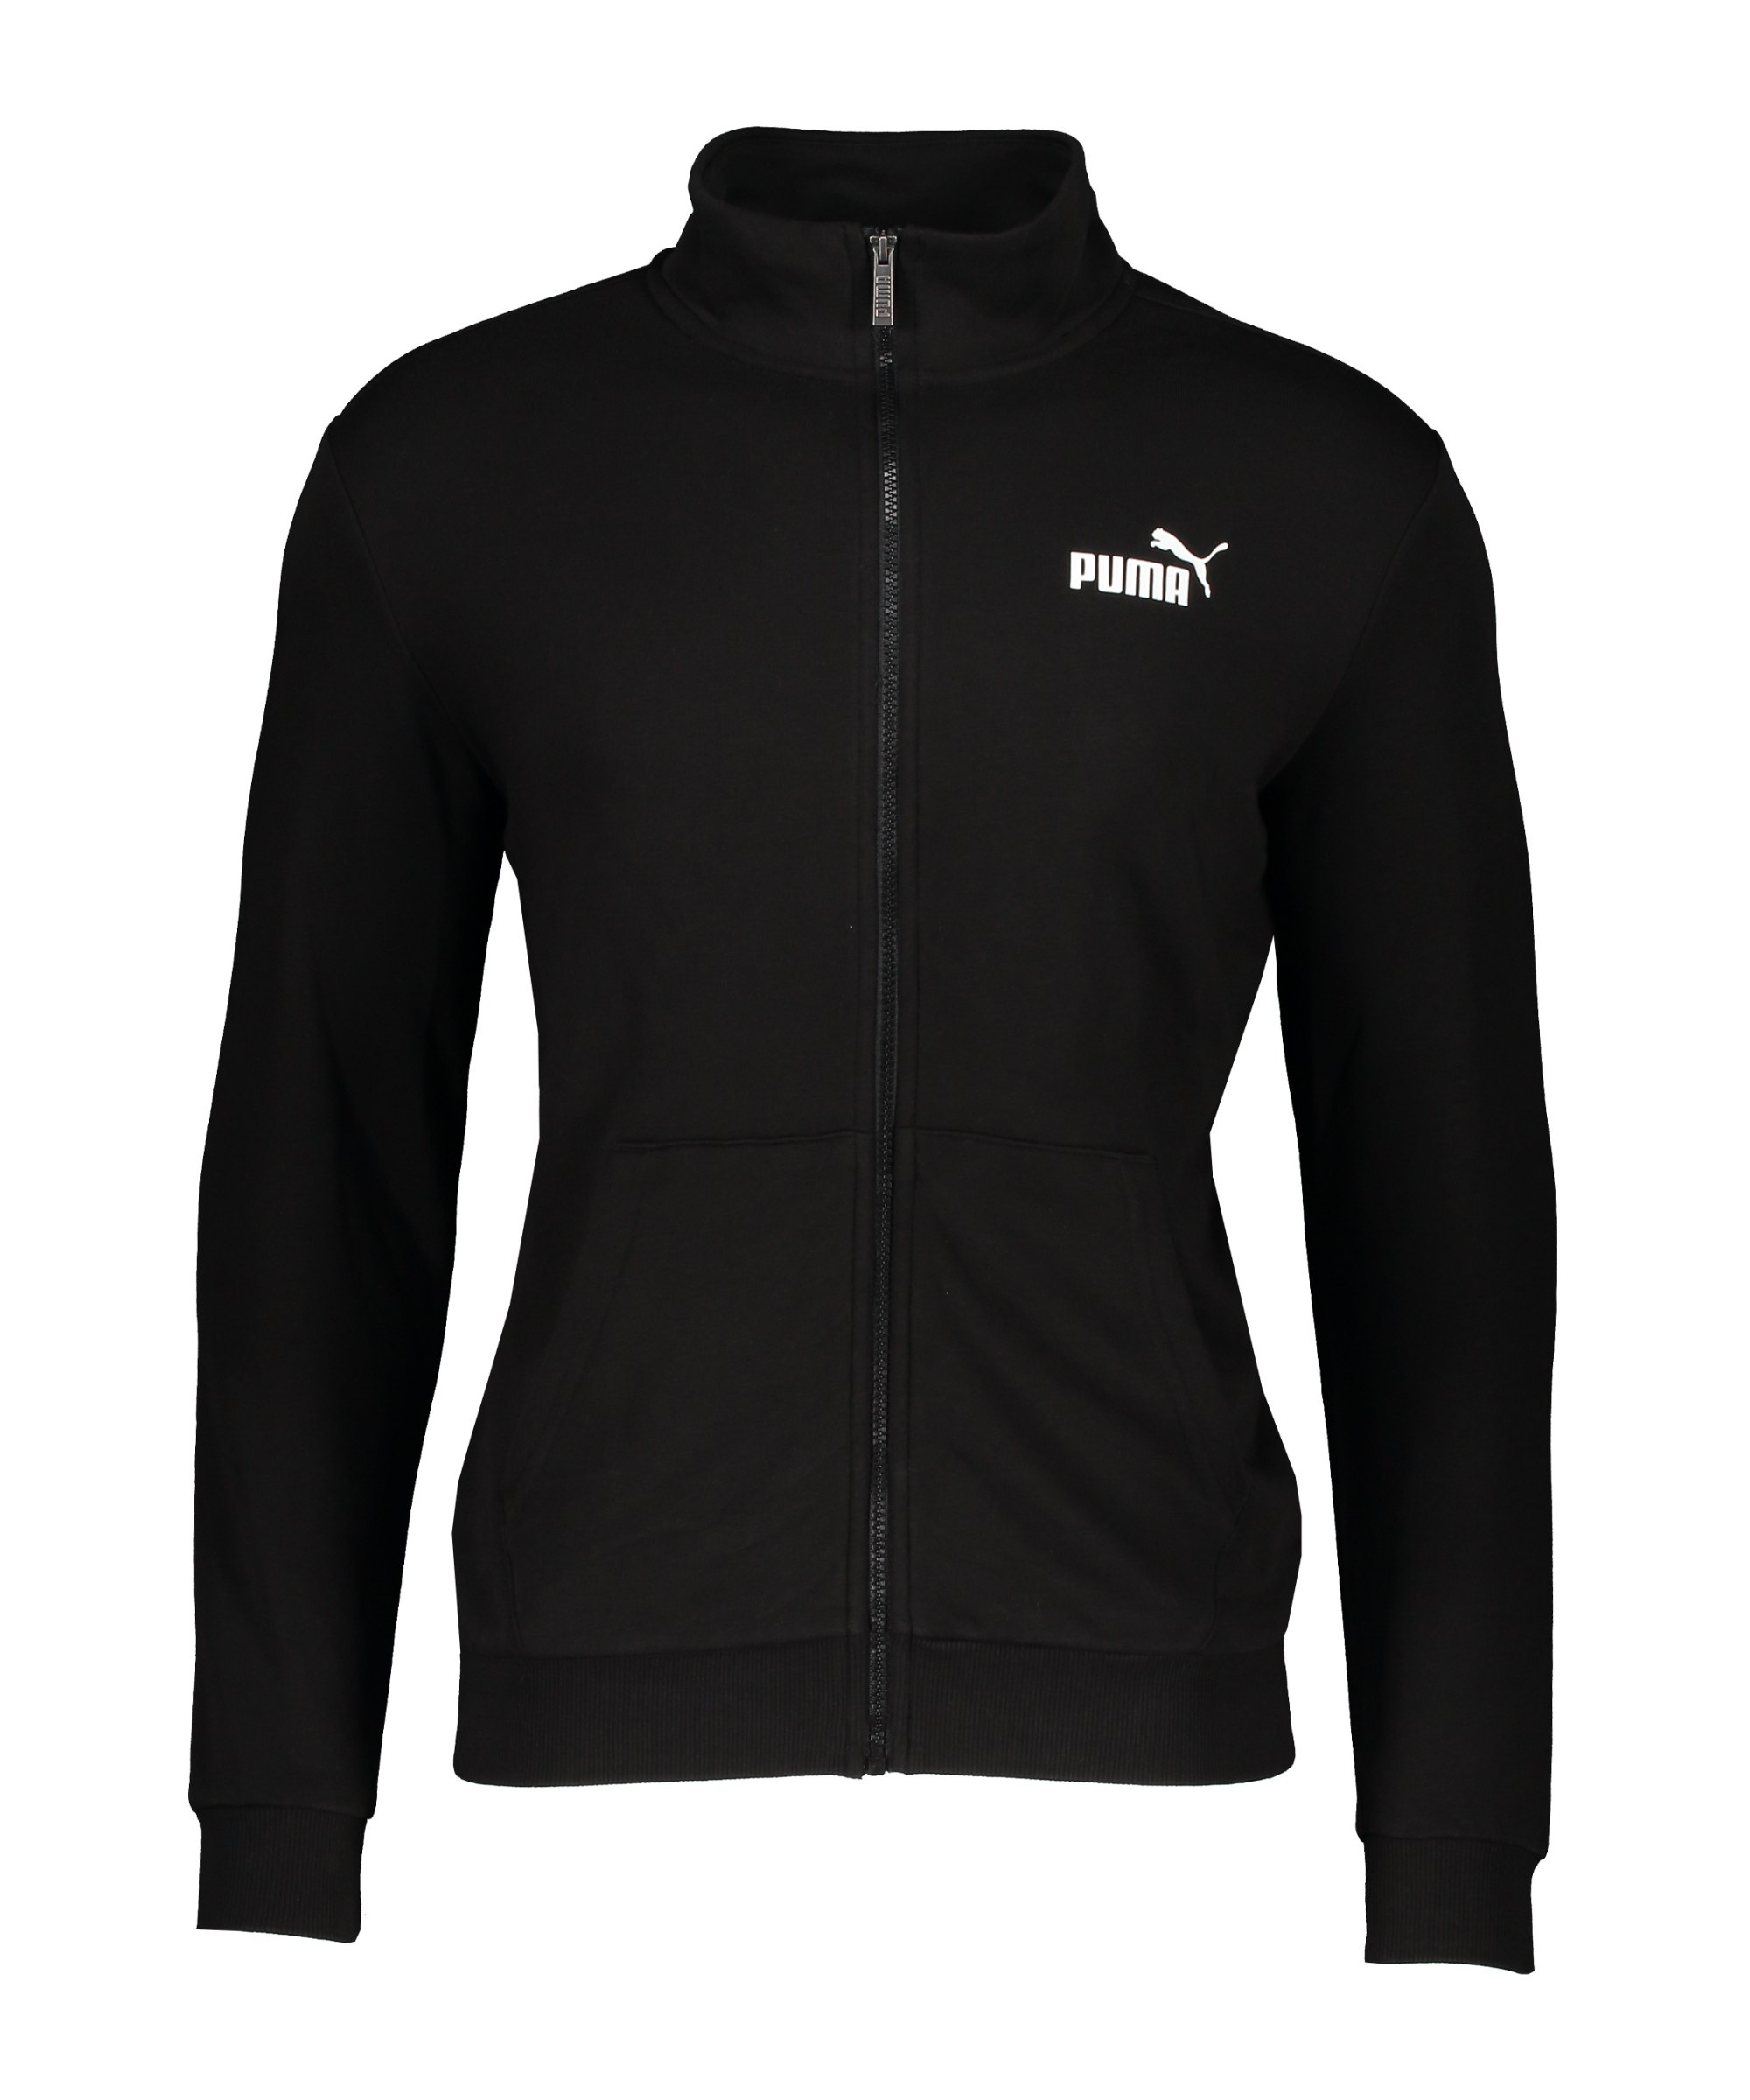 PUMA Essentials Track Trainingsjacke Schwarz F01 - schwarz